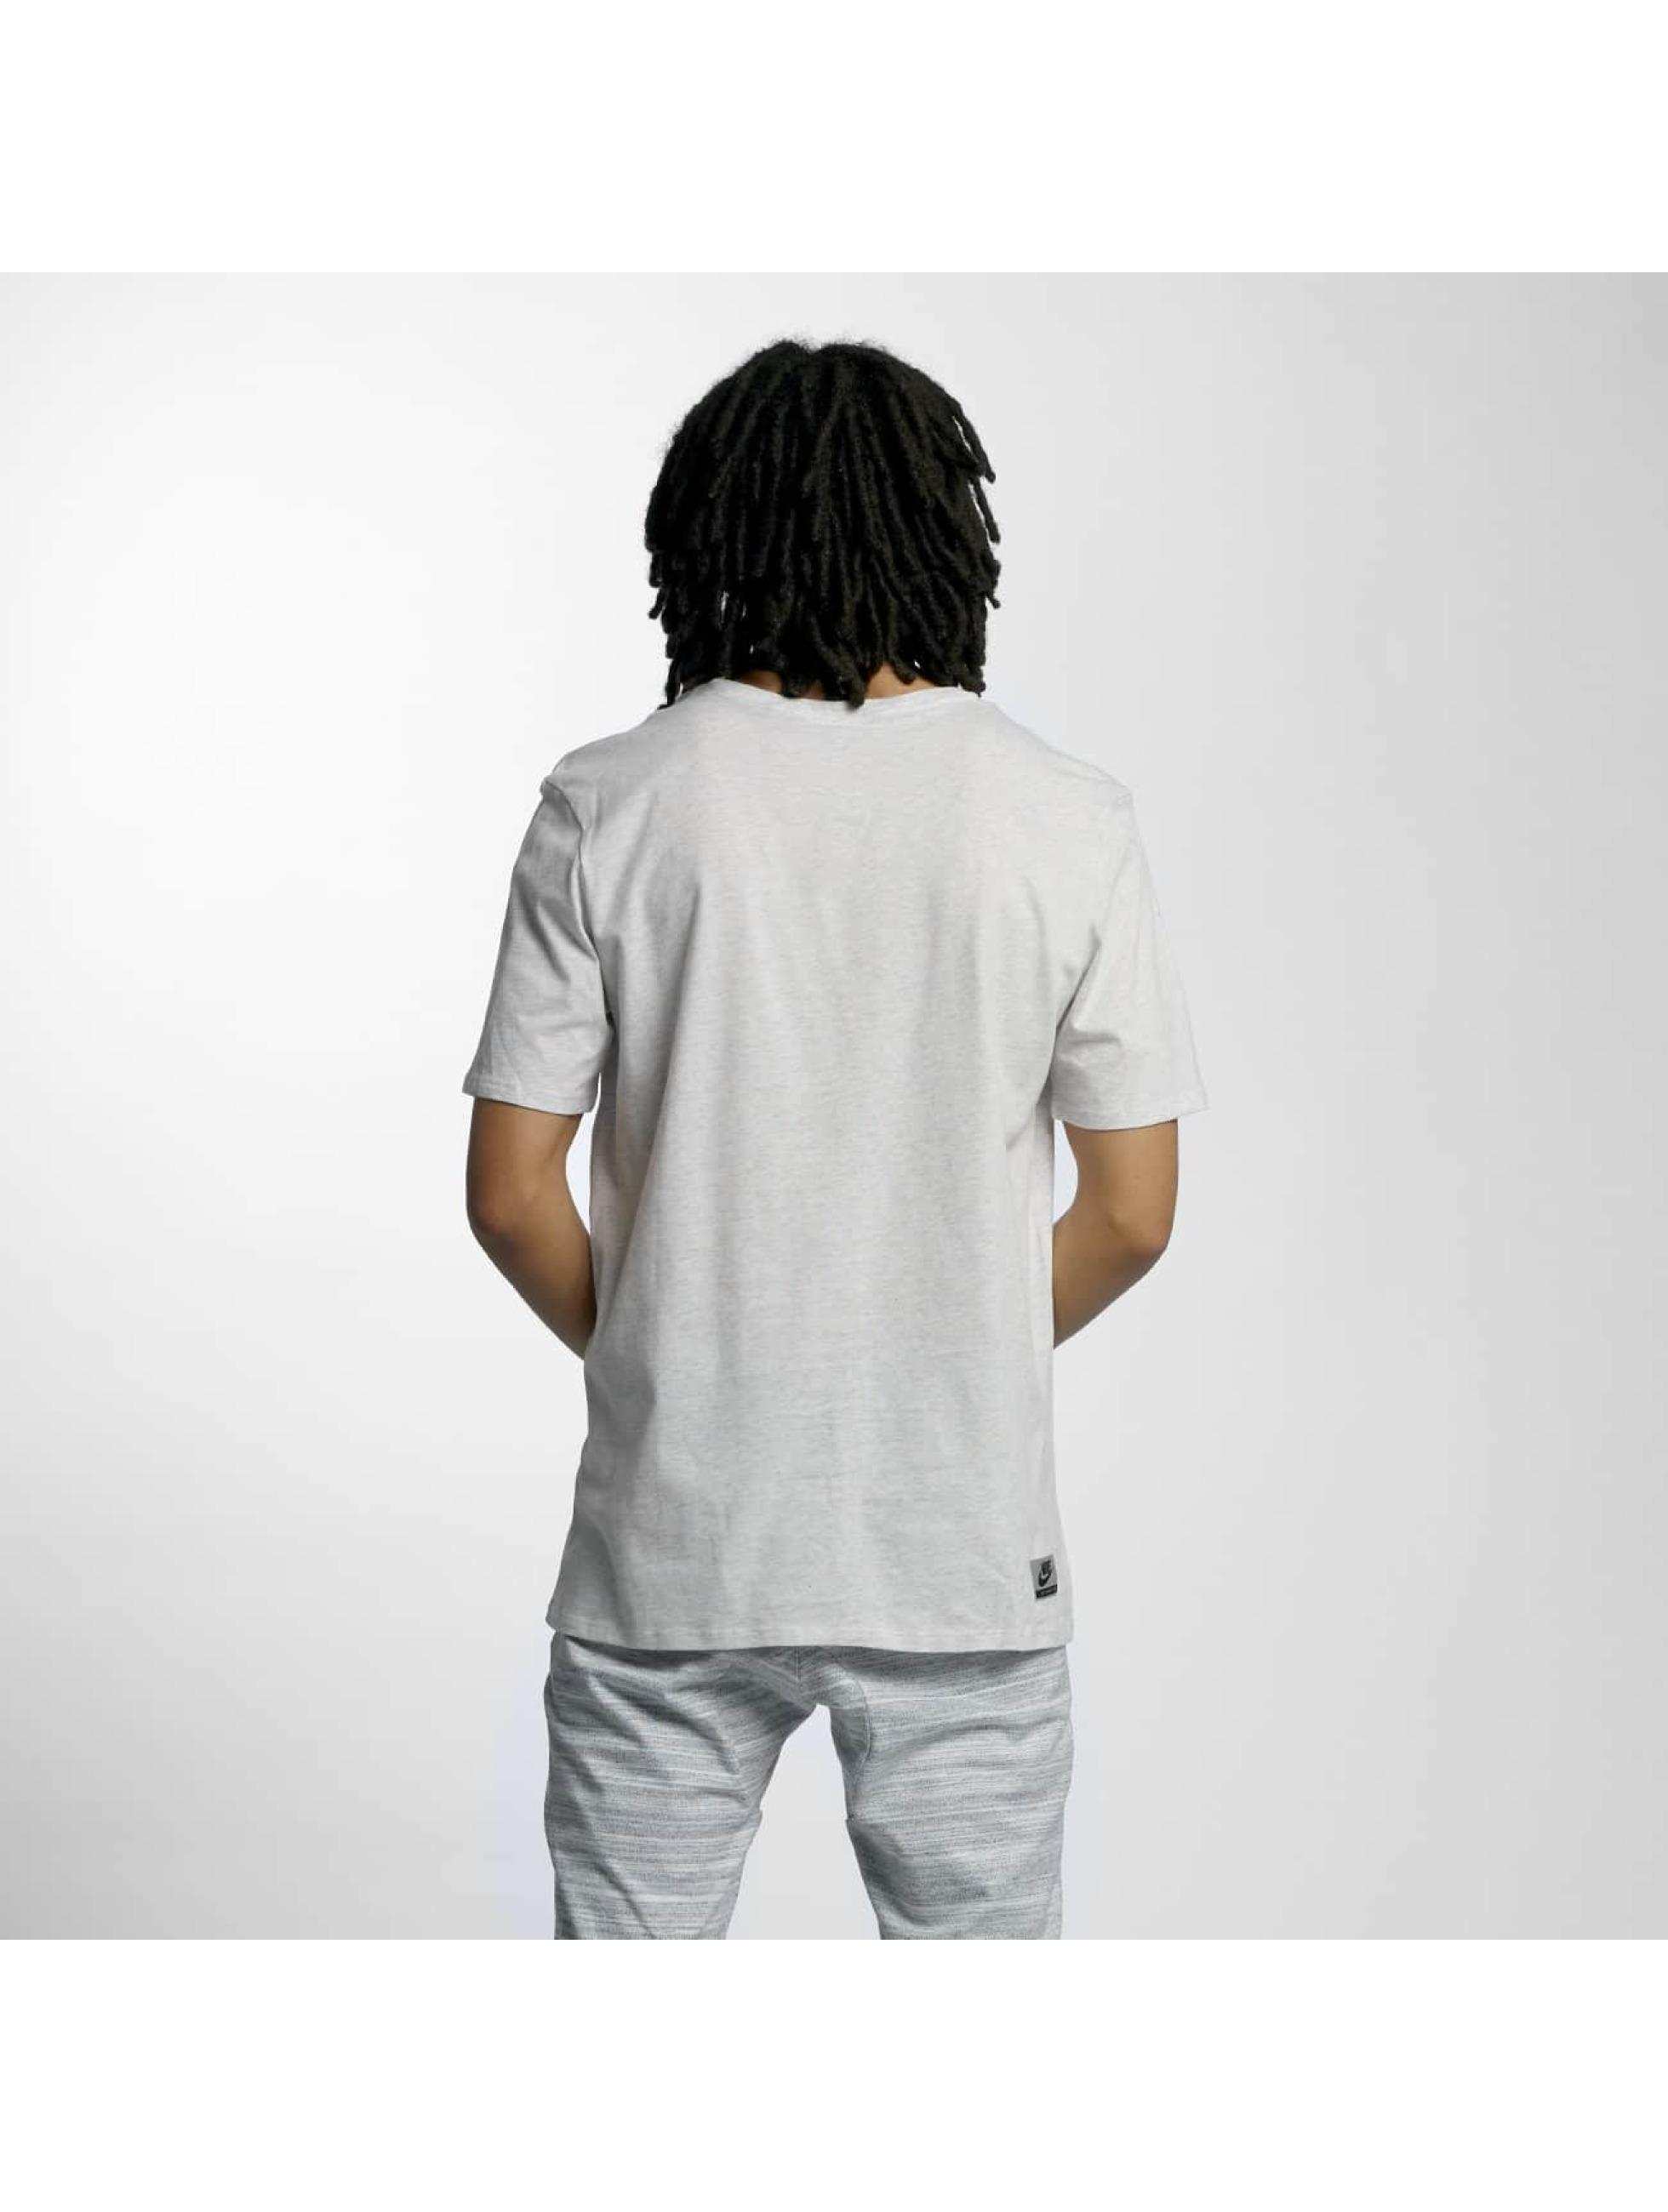 Nike T-Shirt INTL 1 grey